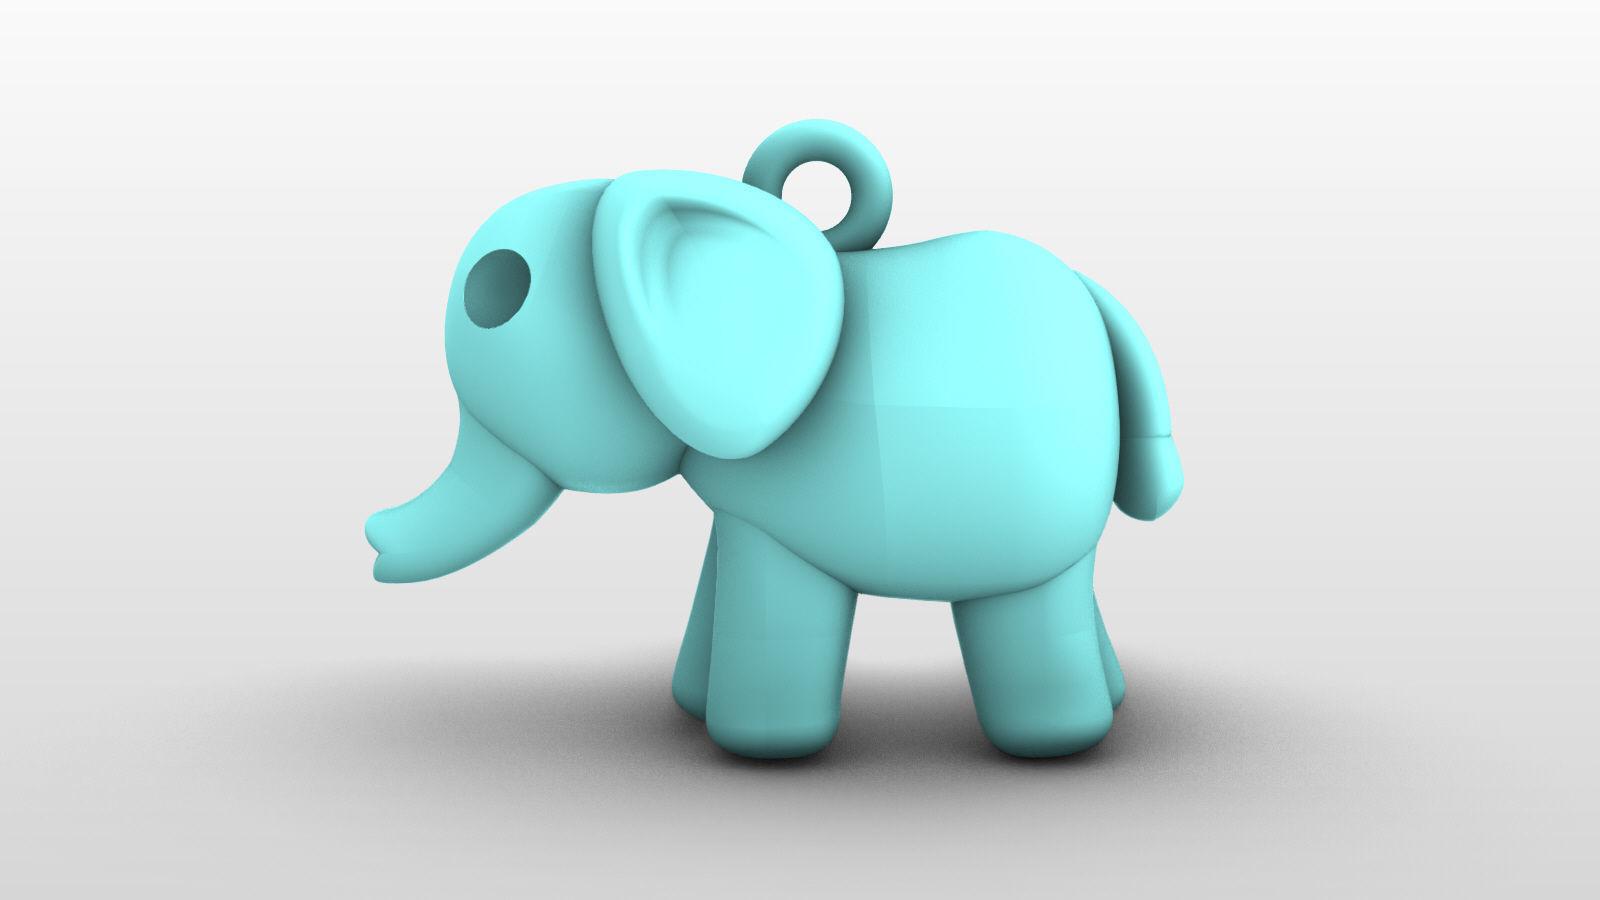 Charm Pendant - Adorable Little Animal - Elephant